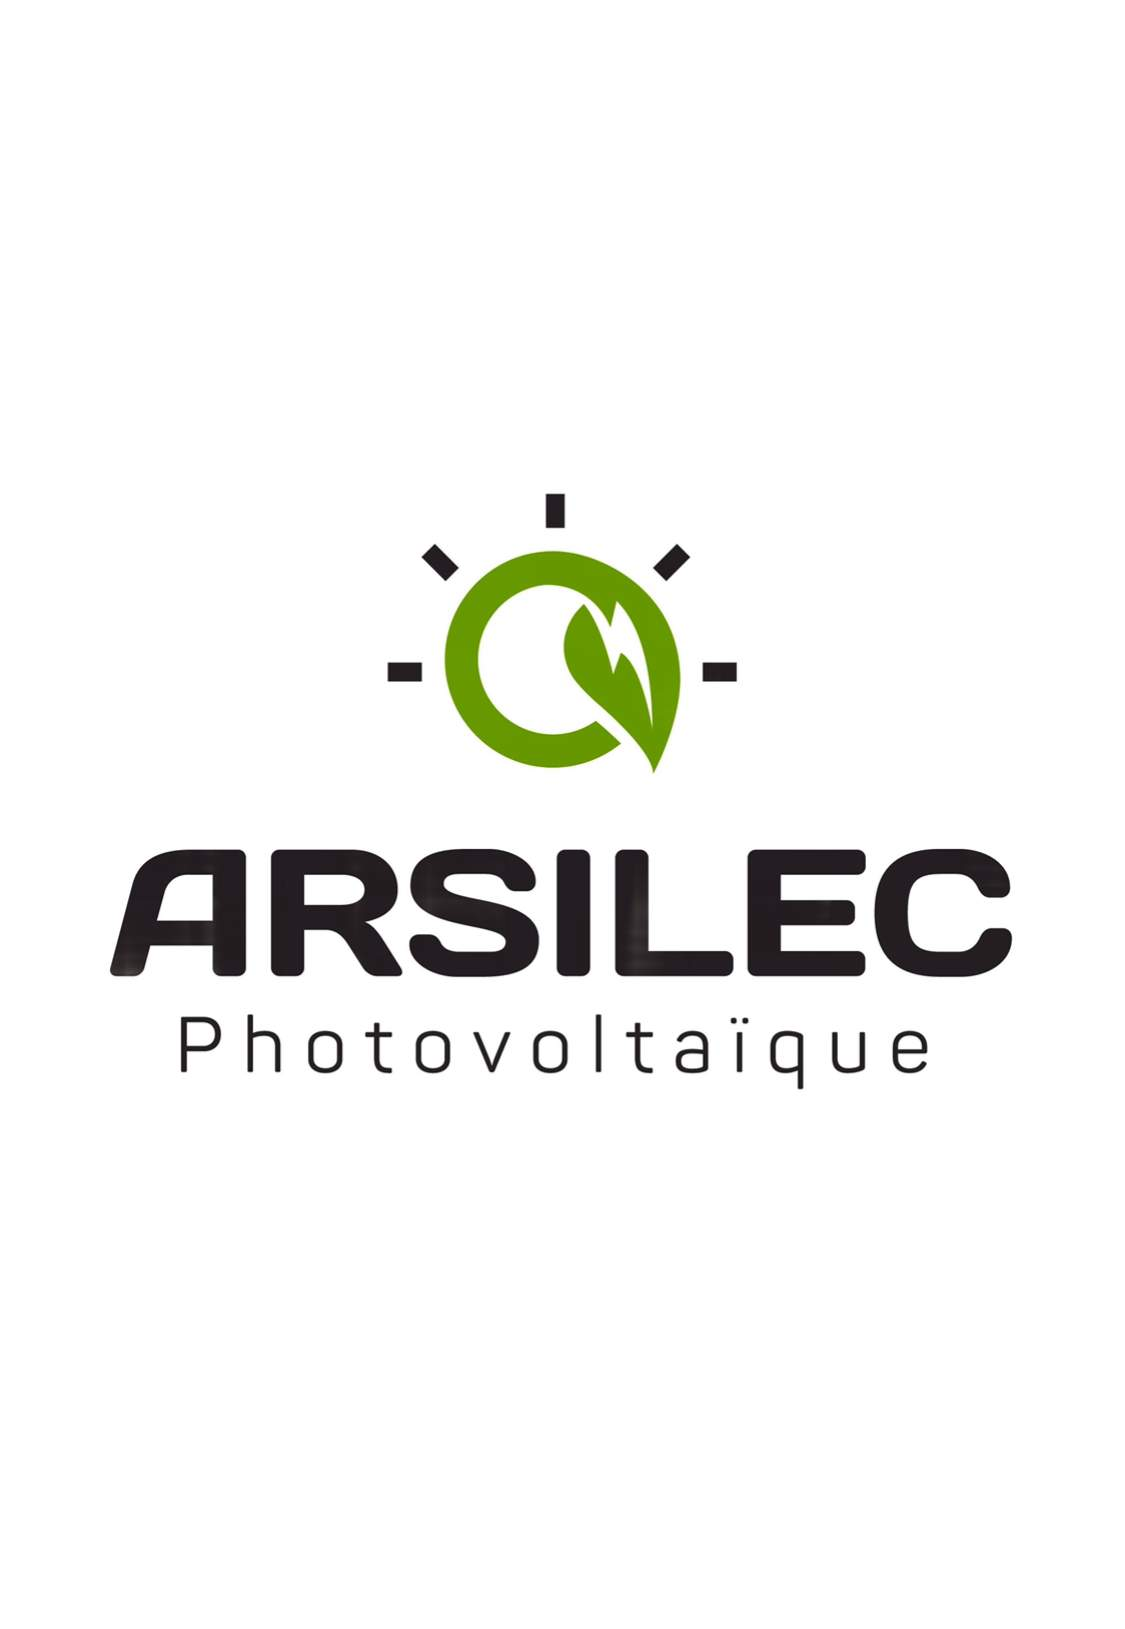 Logo Arsilec photovoltaïque installation de climatisation réversible Rhône 69